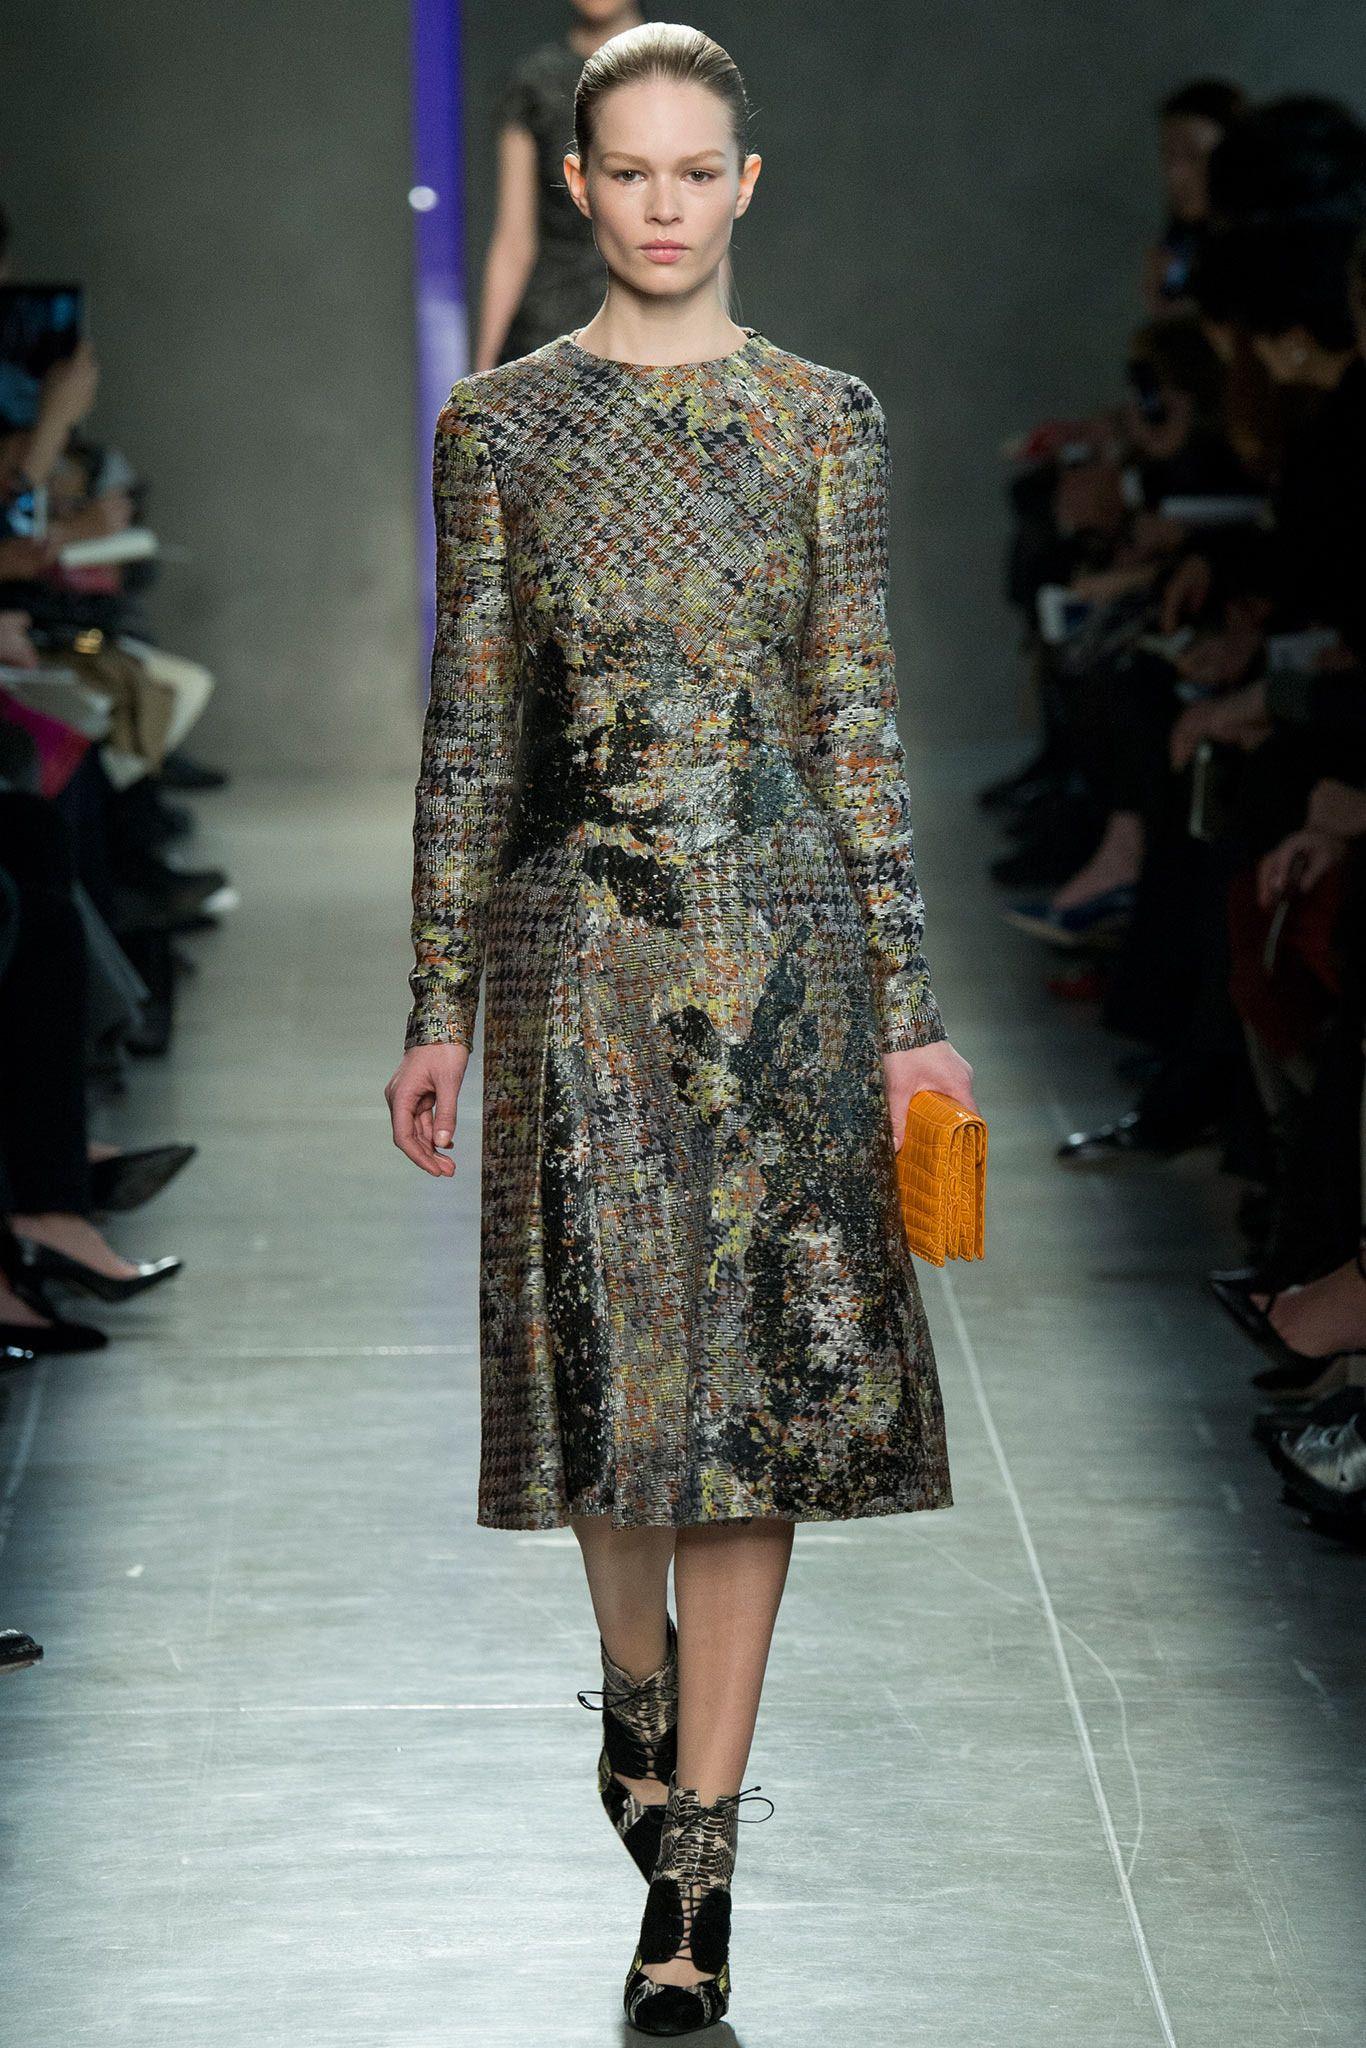 b4624b639d Bottega Veneta Fall 2014 Ready-to-Wear - Collection - Gallery - Style.com